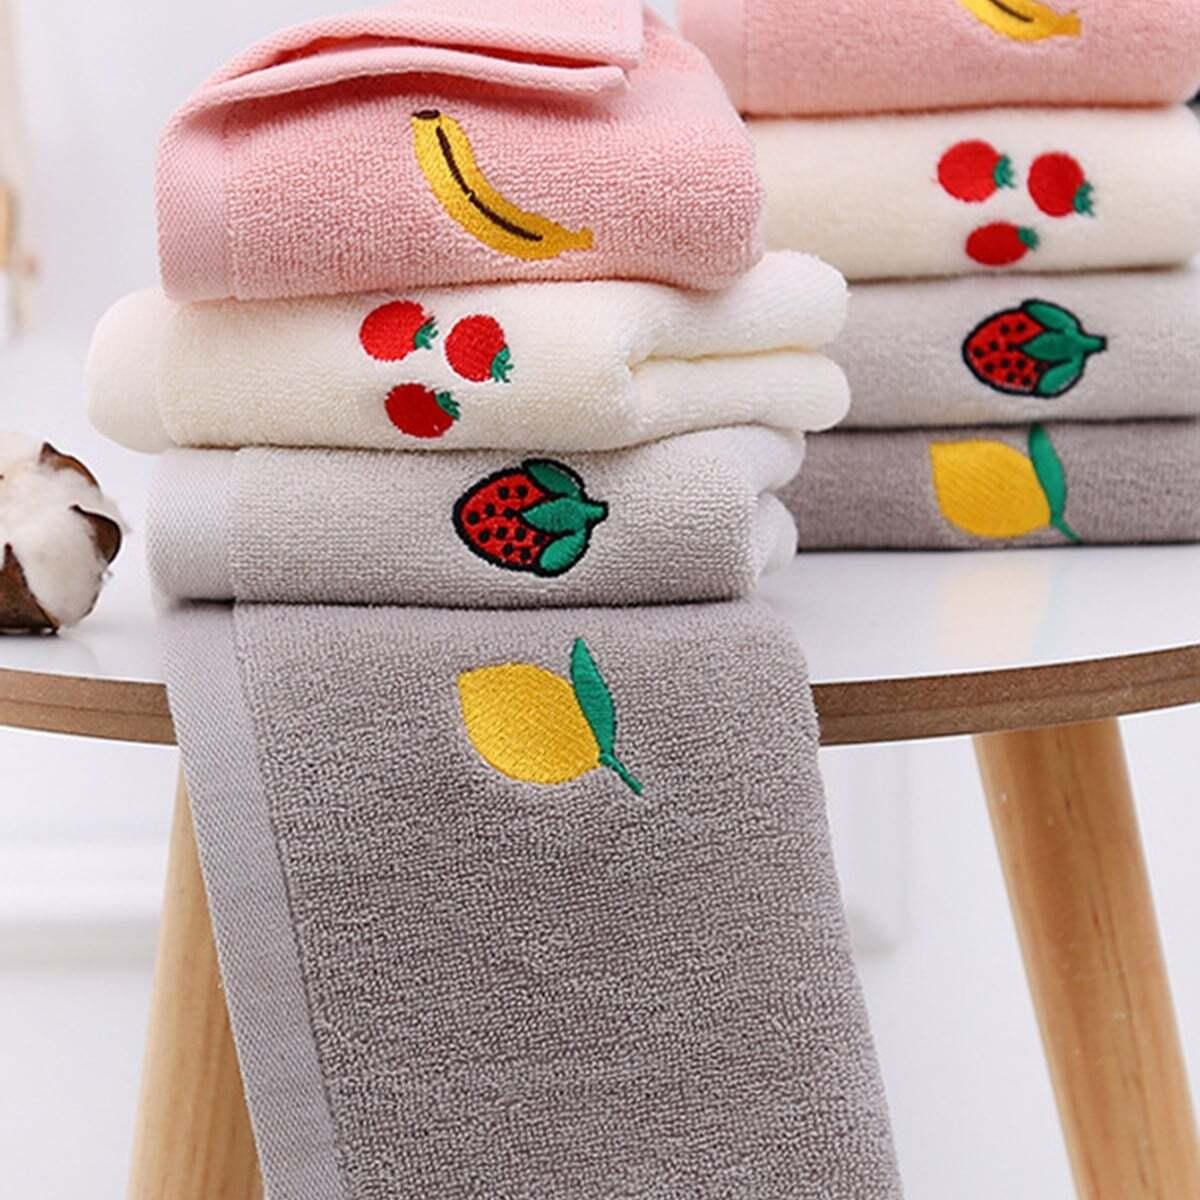 Fruit geborduurde absorberende handdoek 1 st